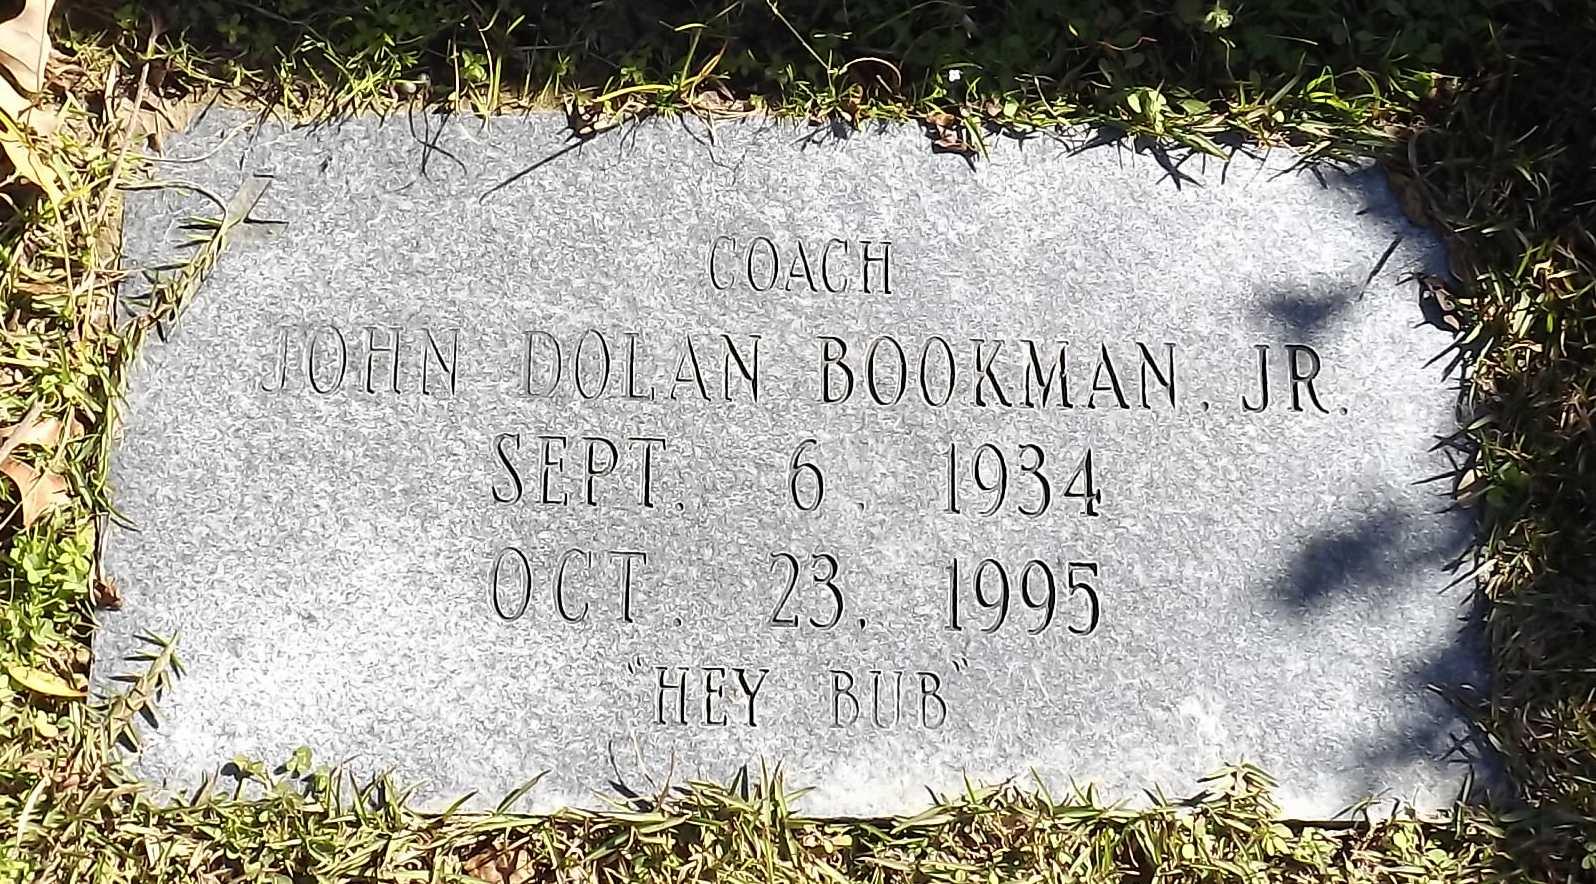 Johnny Bookman